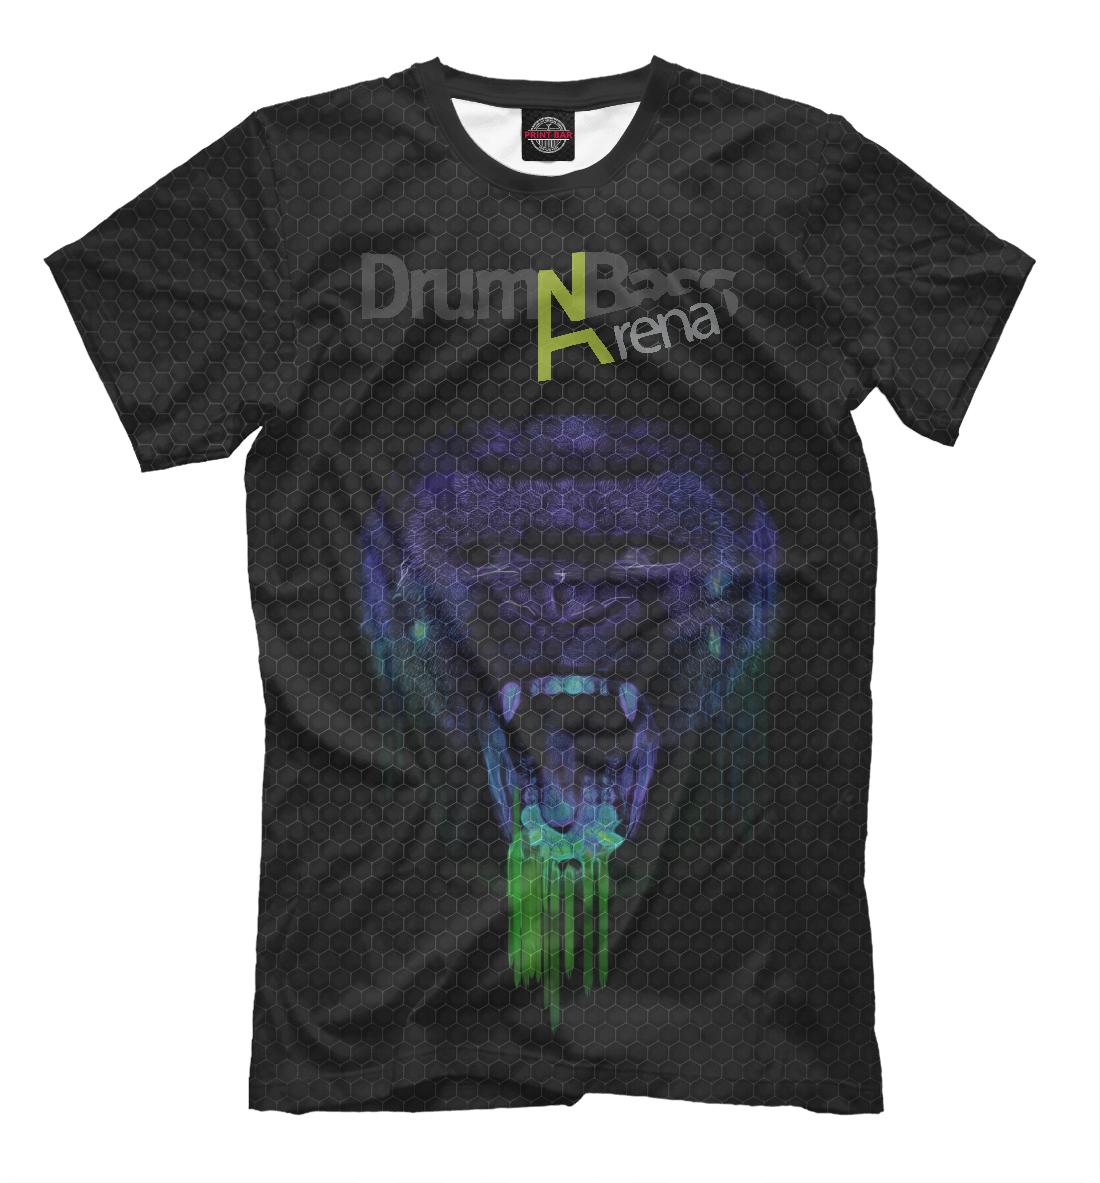 Купить Drum'n'Bass Arena, Printbar, Футболки, MZK-711721-fut-2